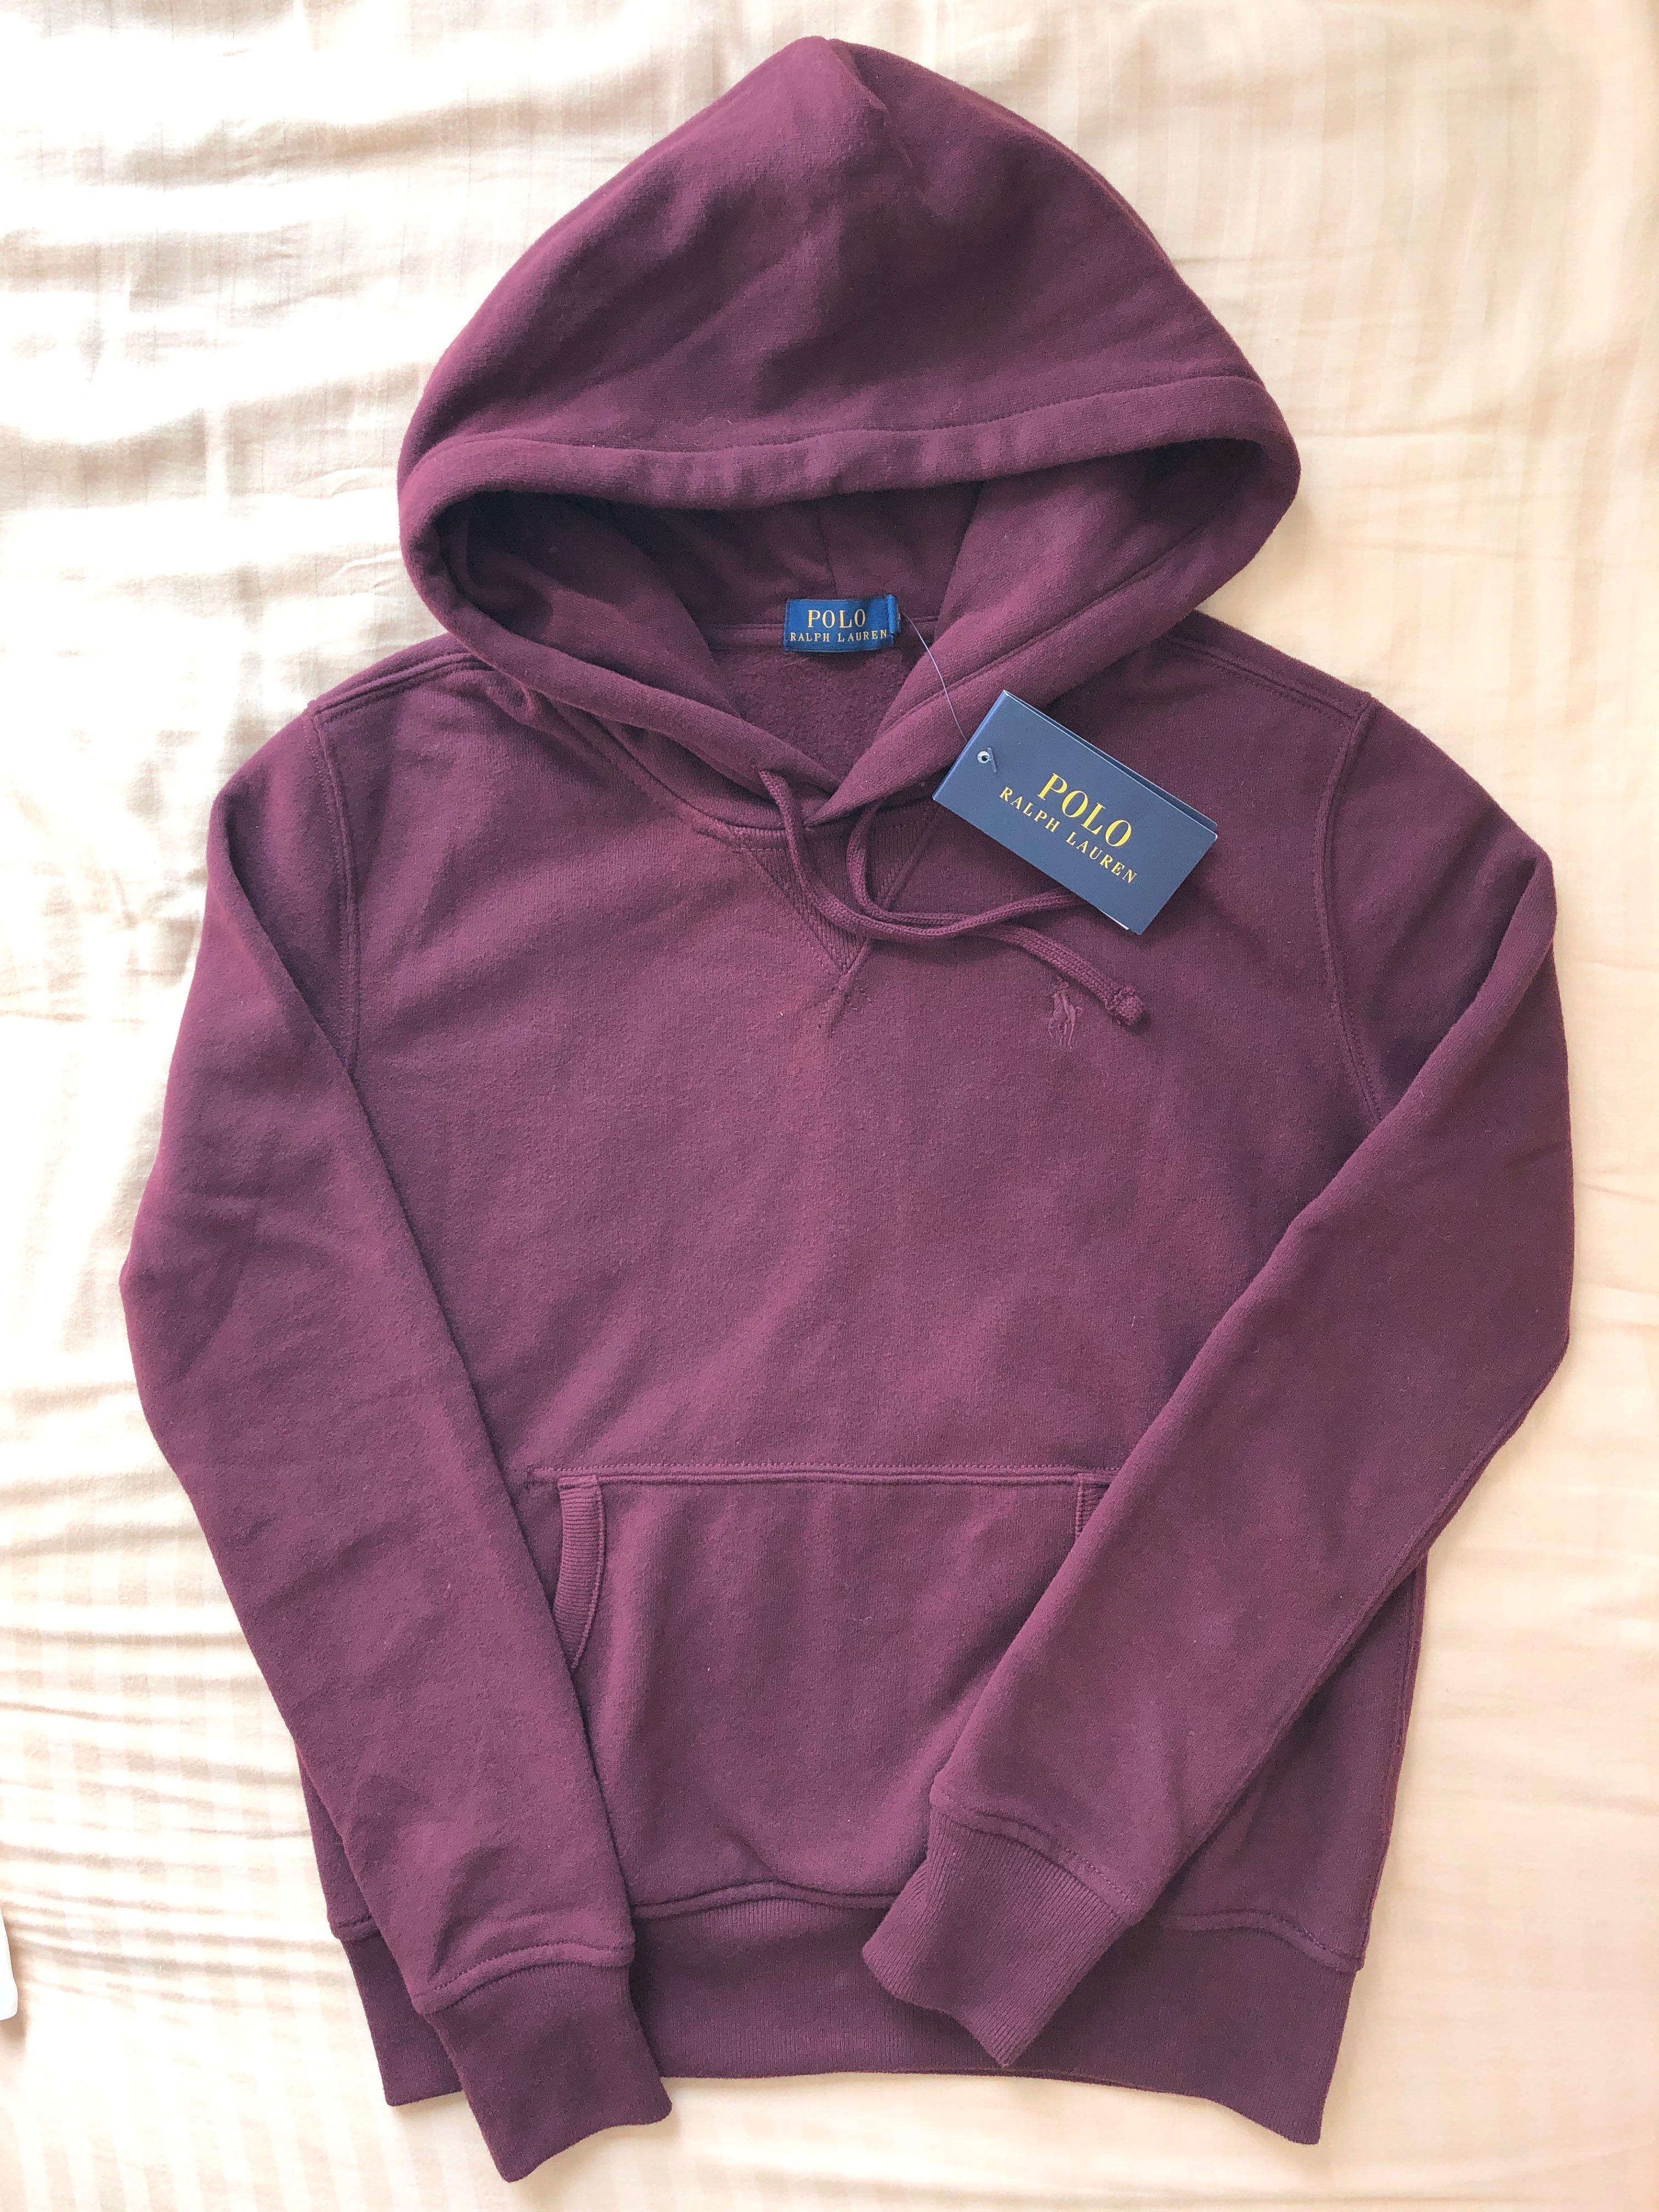 134a8ff0 Polo ralph lauren hoodie pullover burgundy 衛衣